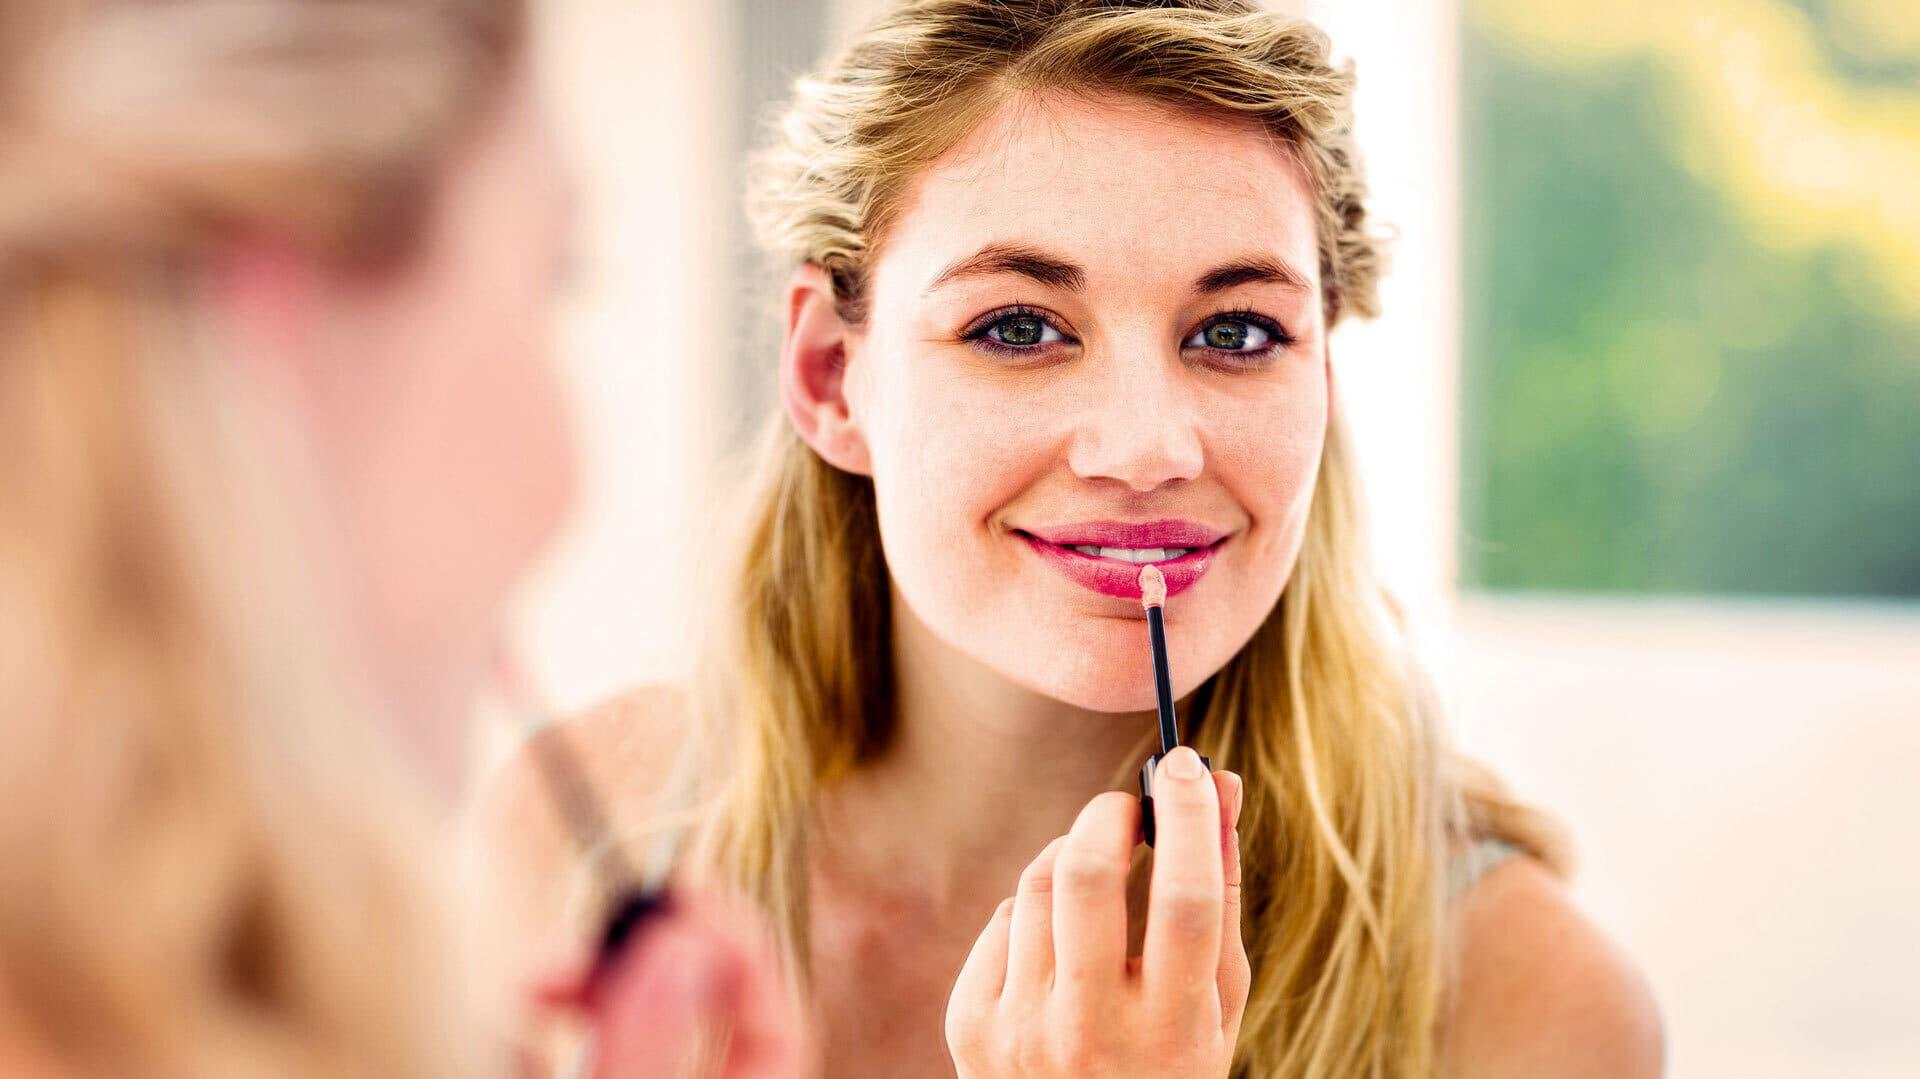 Eine Frau trägt Lipgloss auf